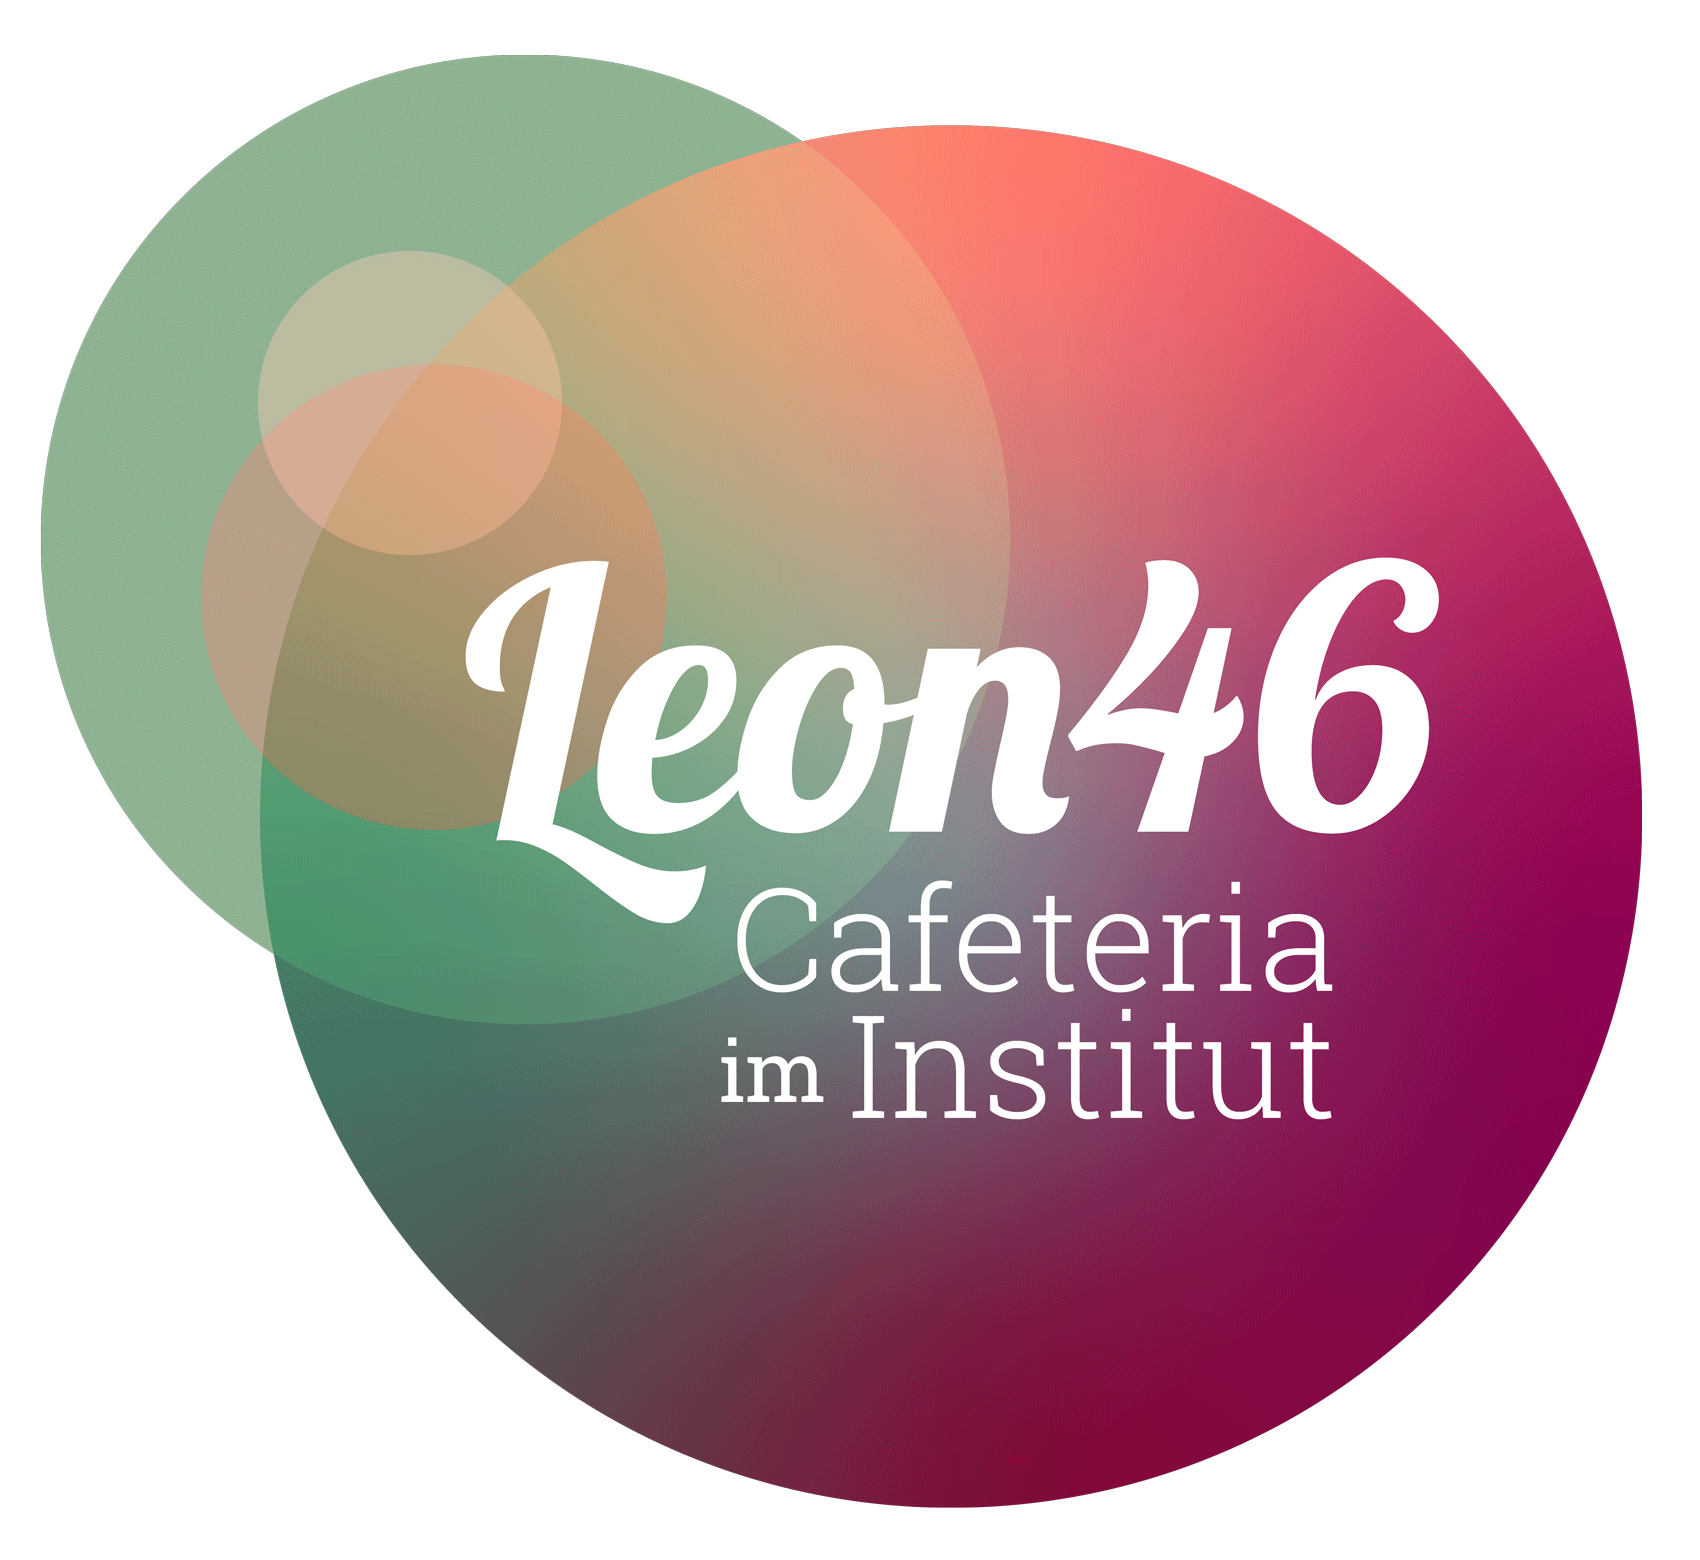 Leon46 Logo